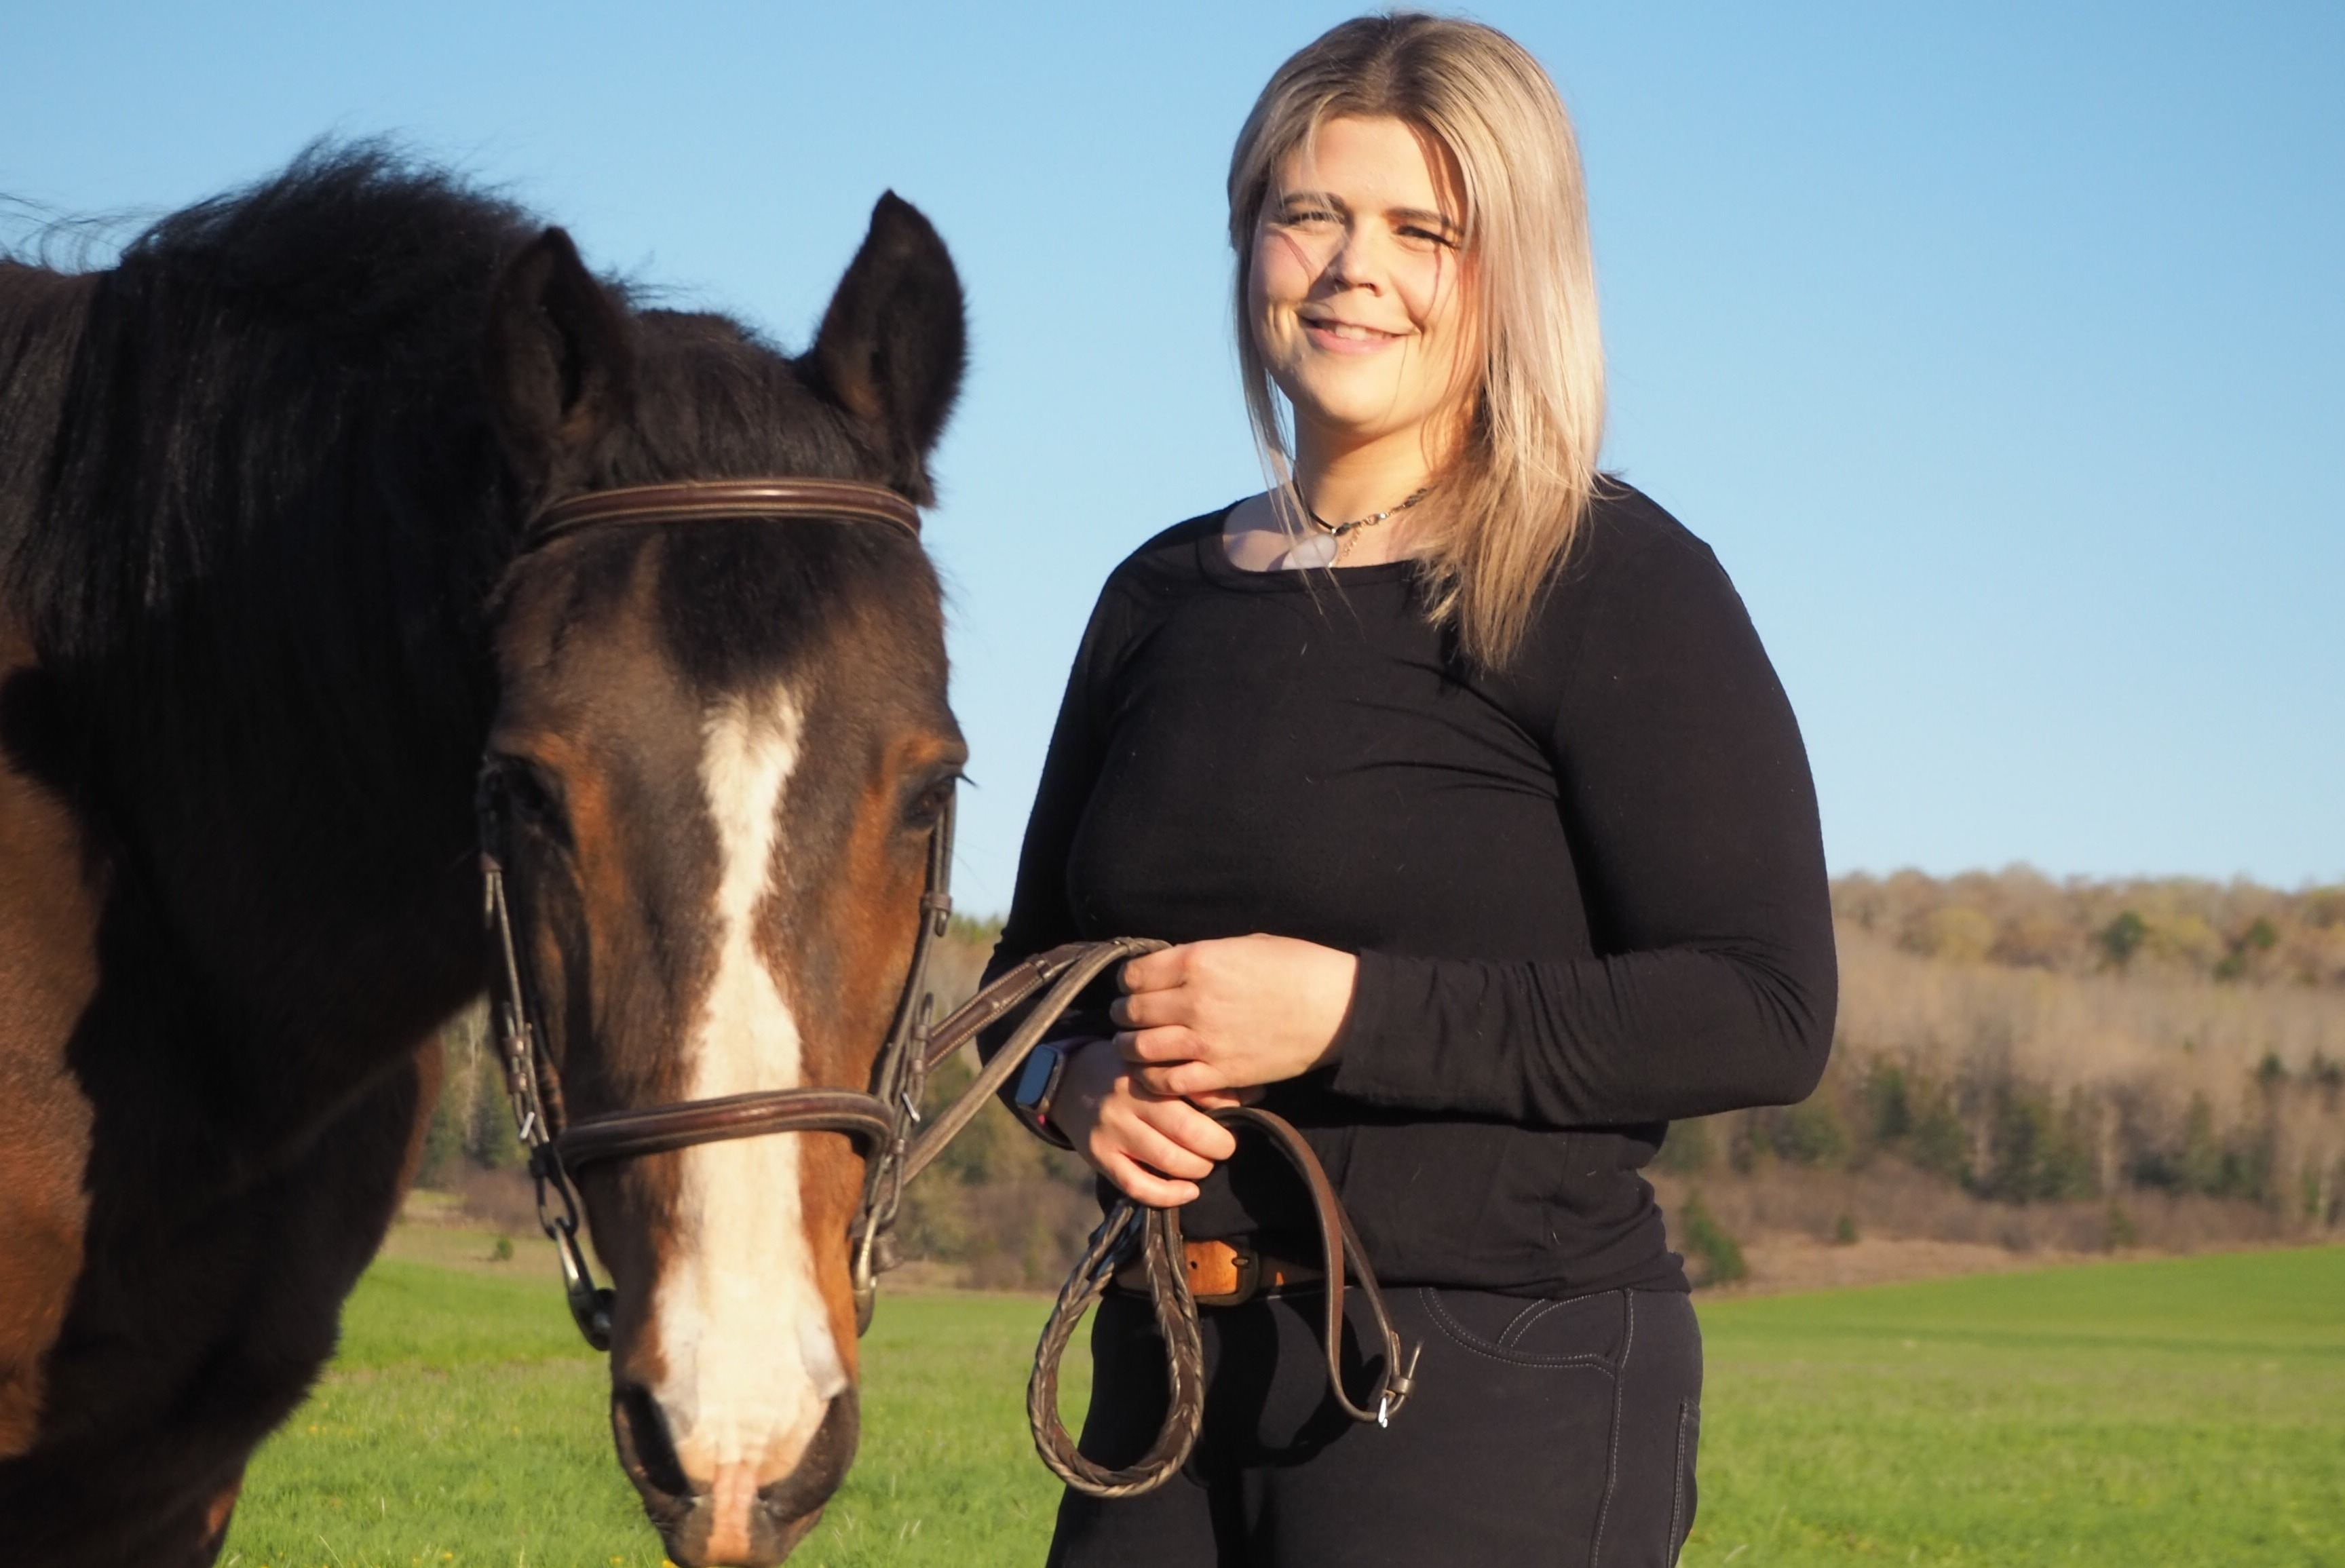 Amanda Greaves - FMS advisor at LBJ Farm Equipment